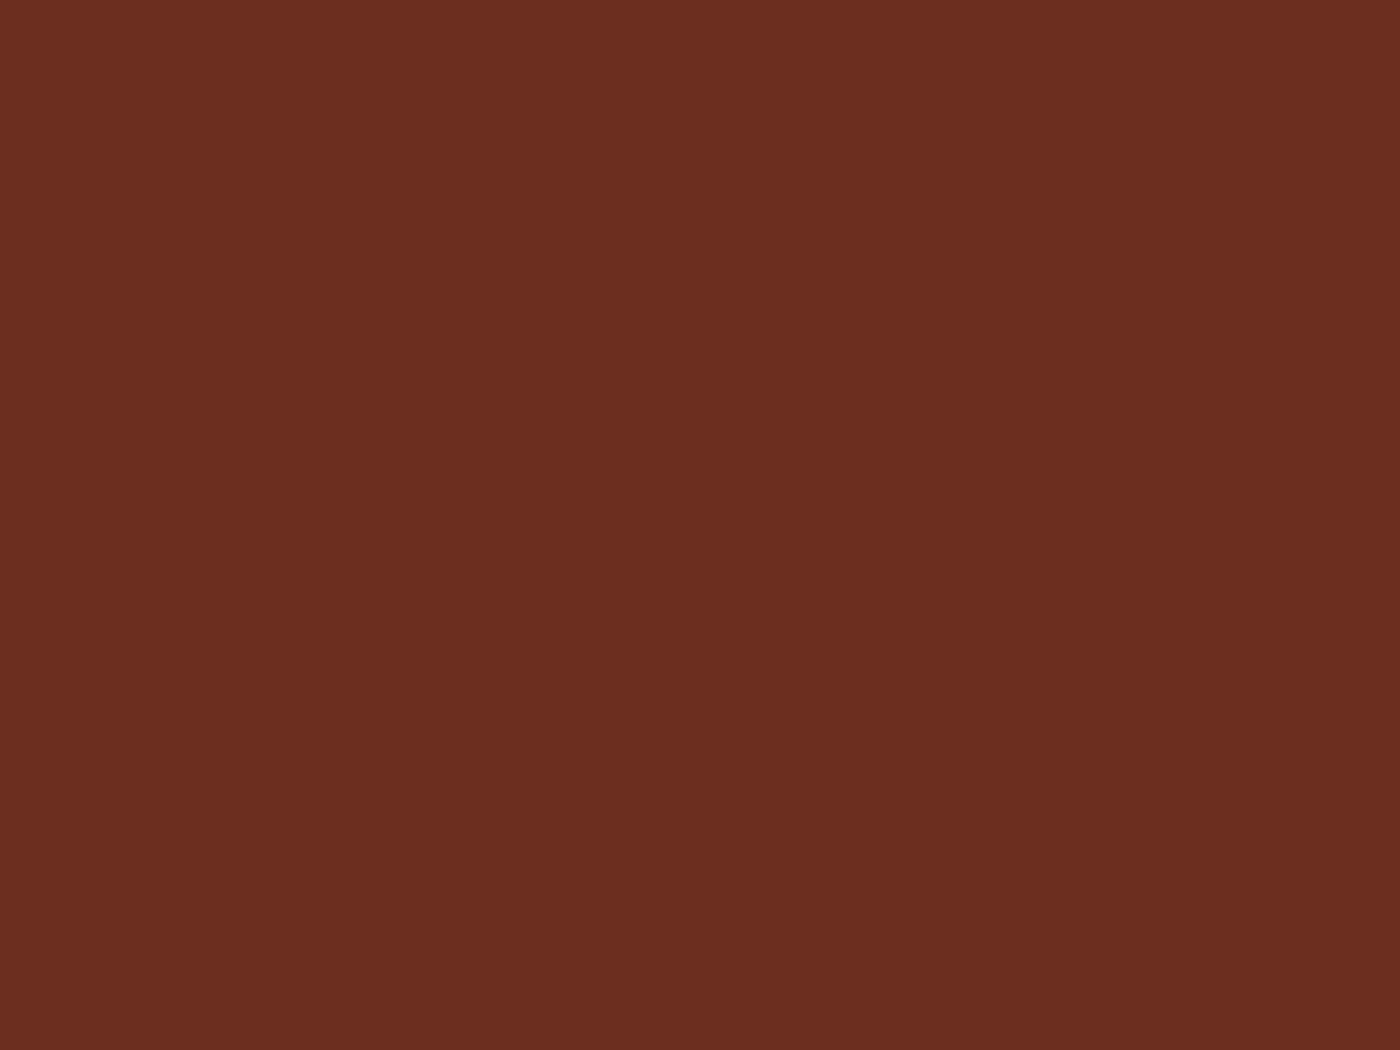 1400x1050 Liver Organ Solid Color Background